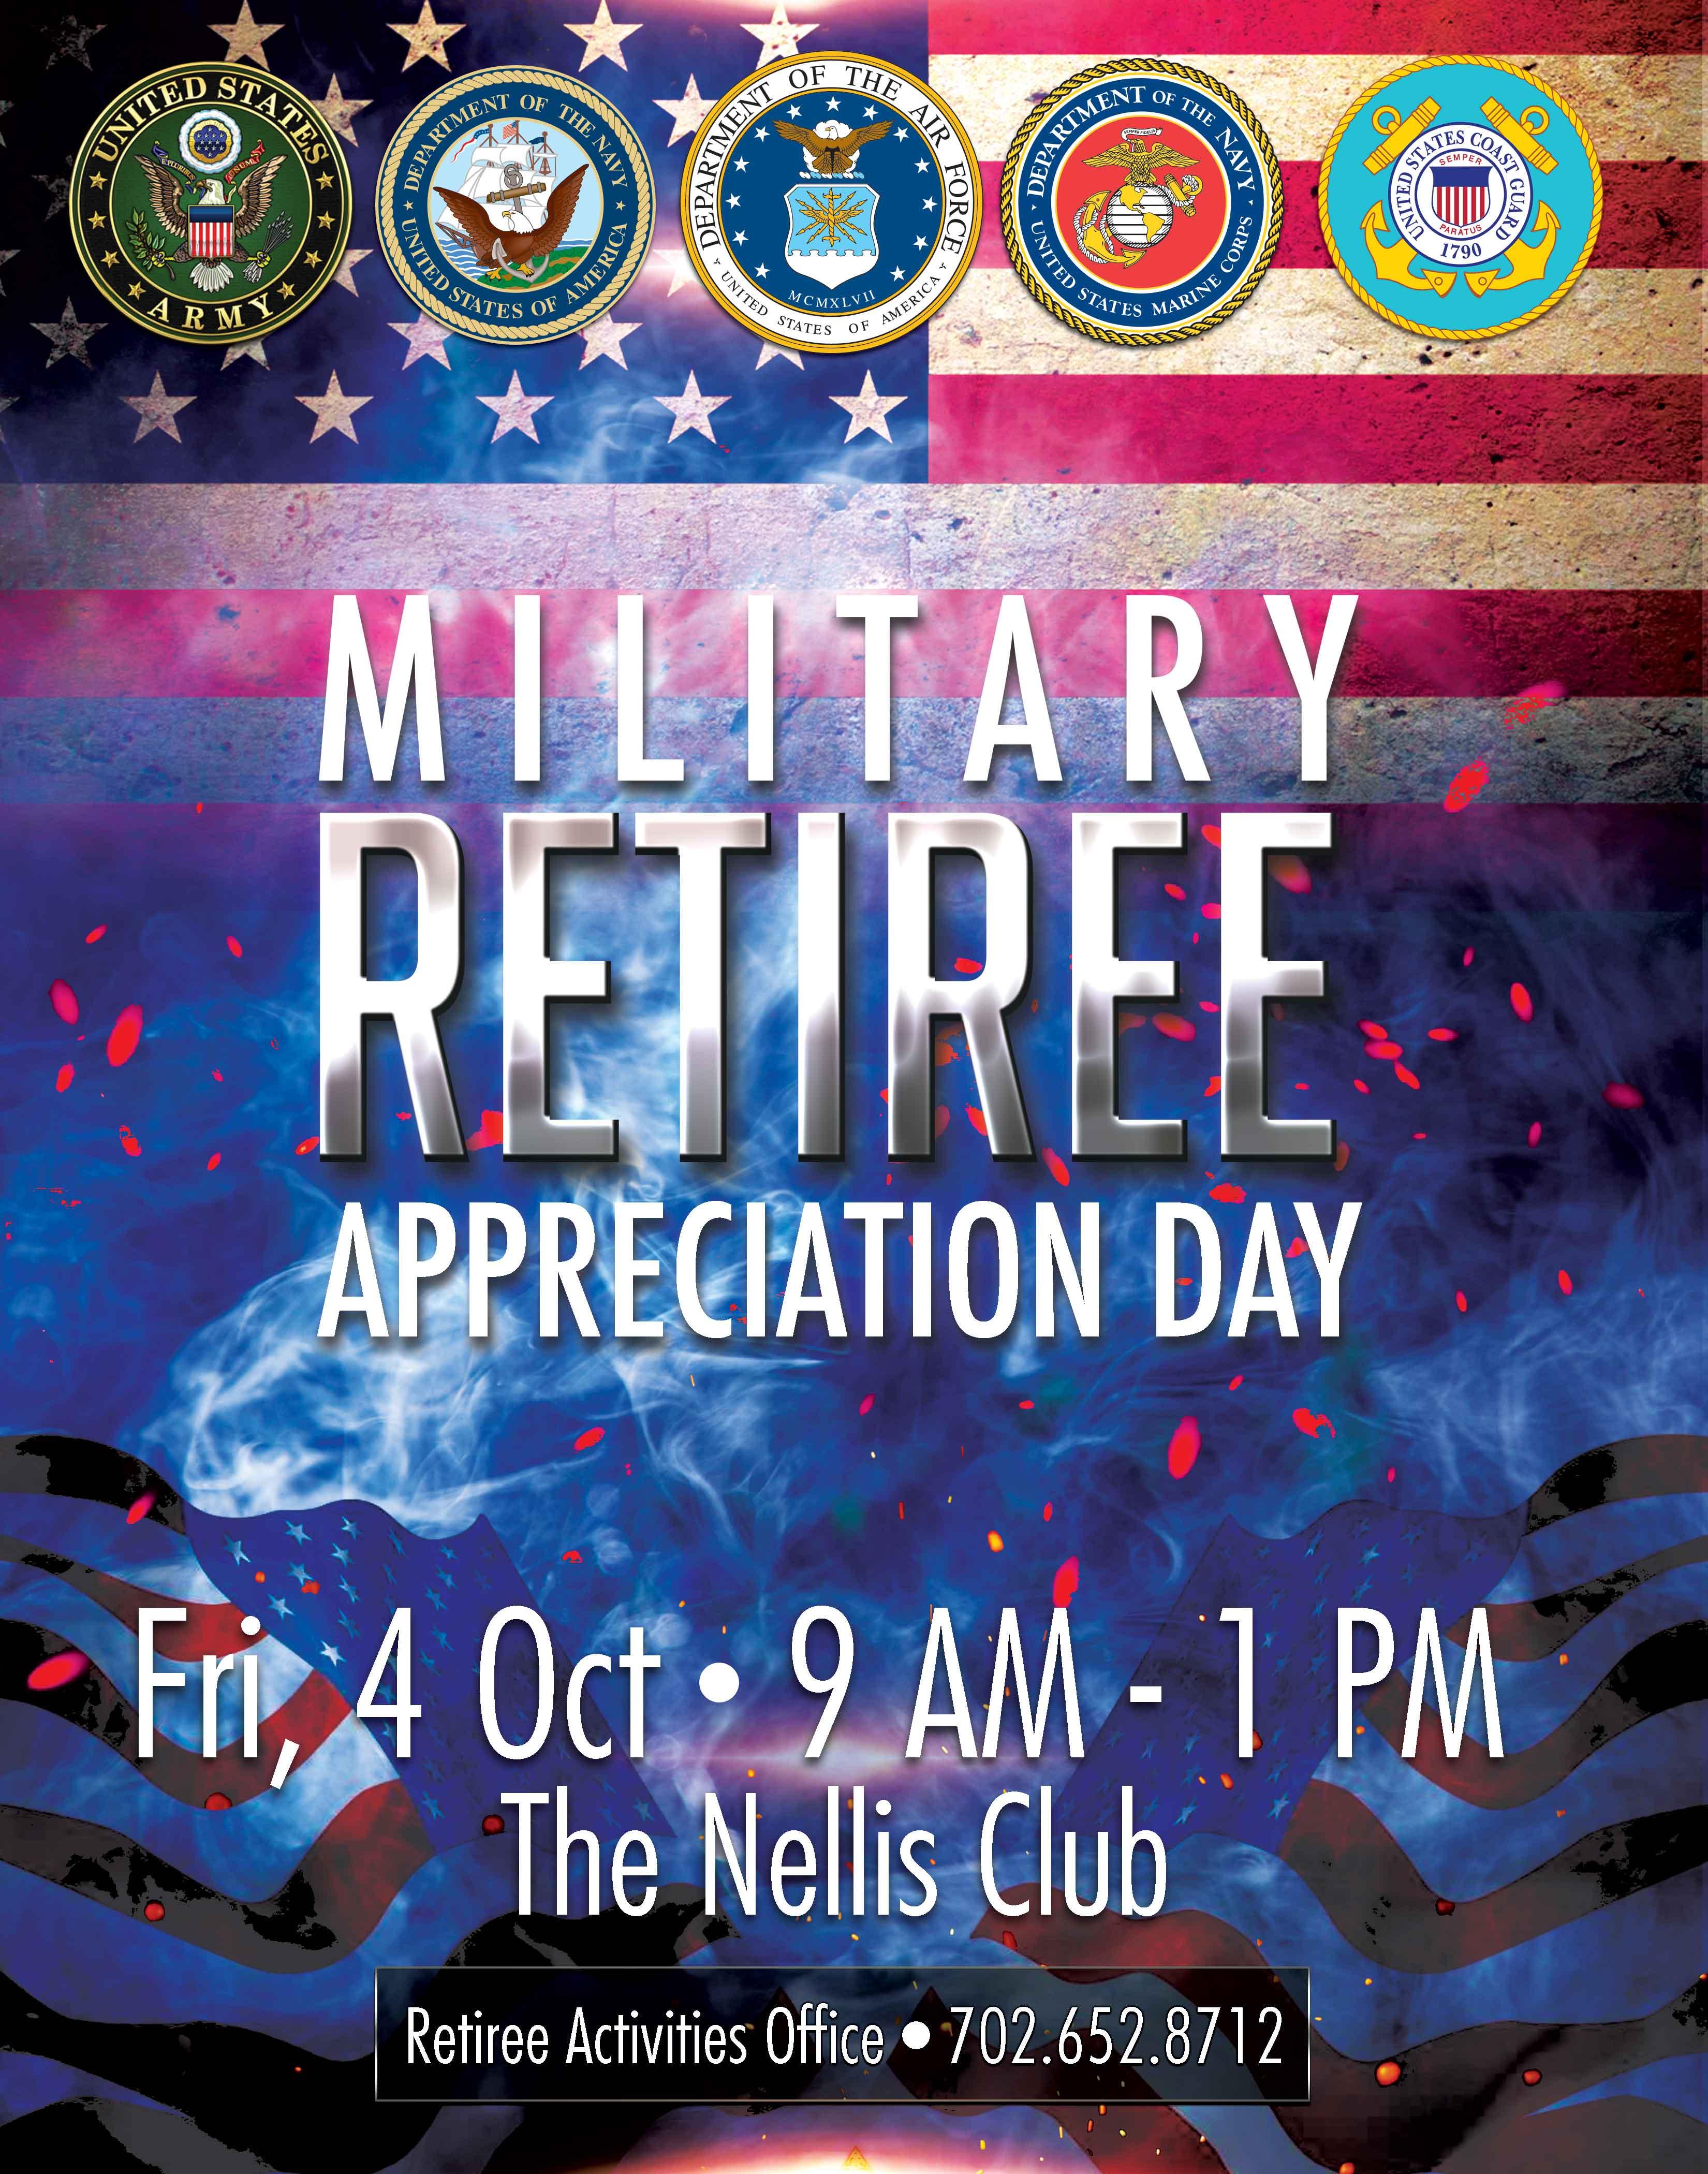 Military Retiree Appreciation Day Nellis Life